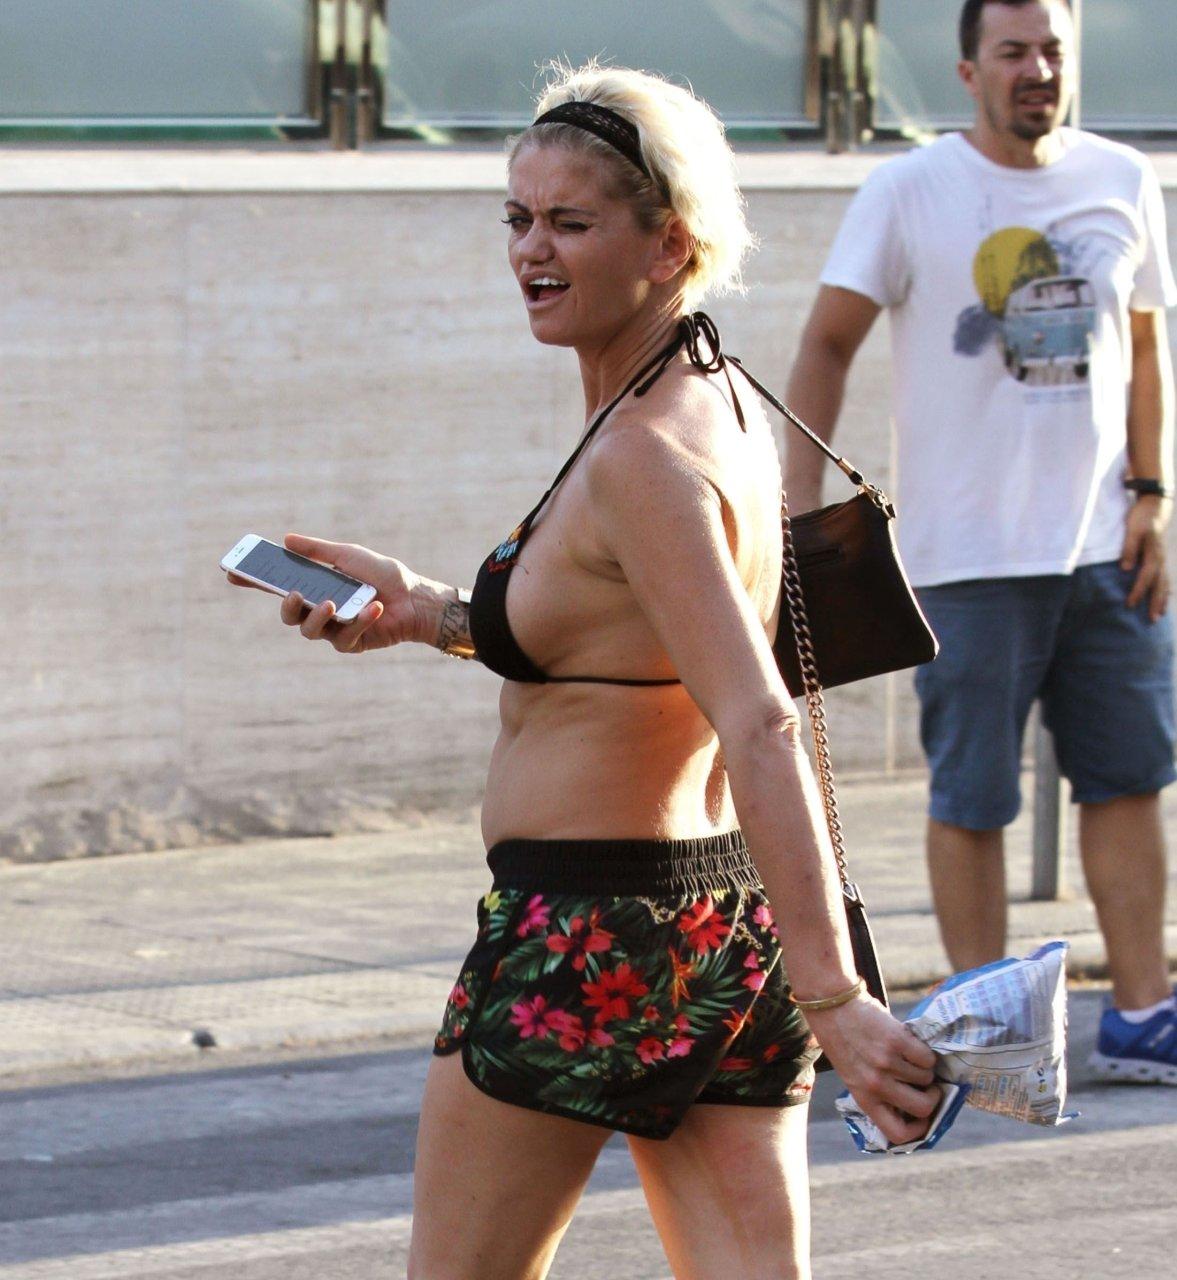 Boobs Melanie Brown naked (43 foto and video), Topless, Bikini, Twitter, cameltoe 2020